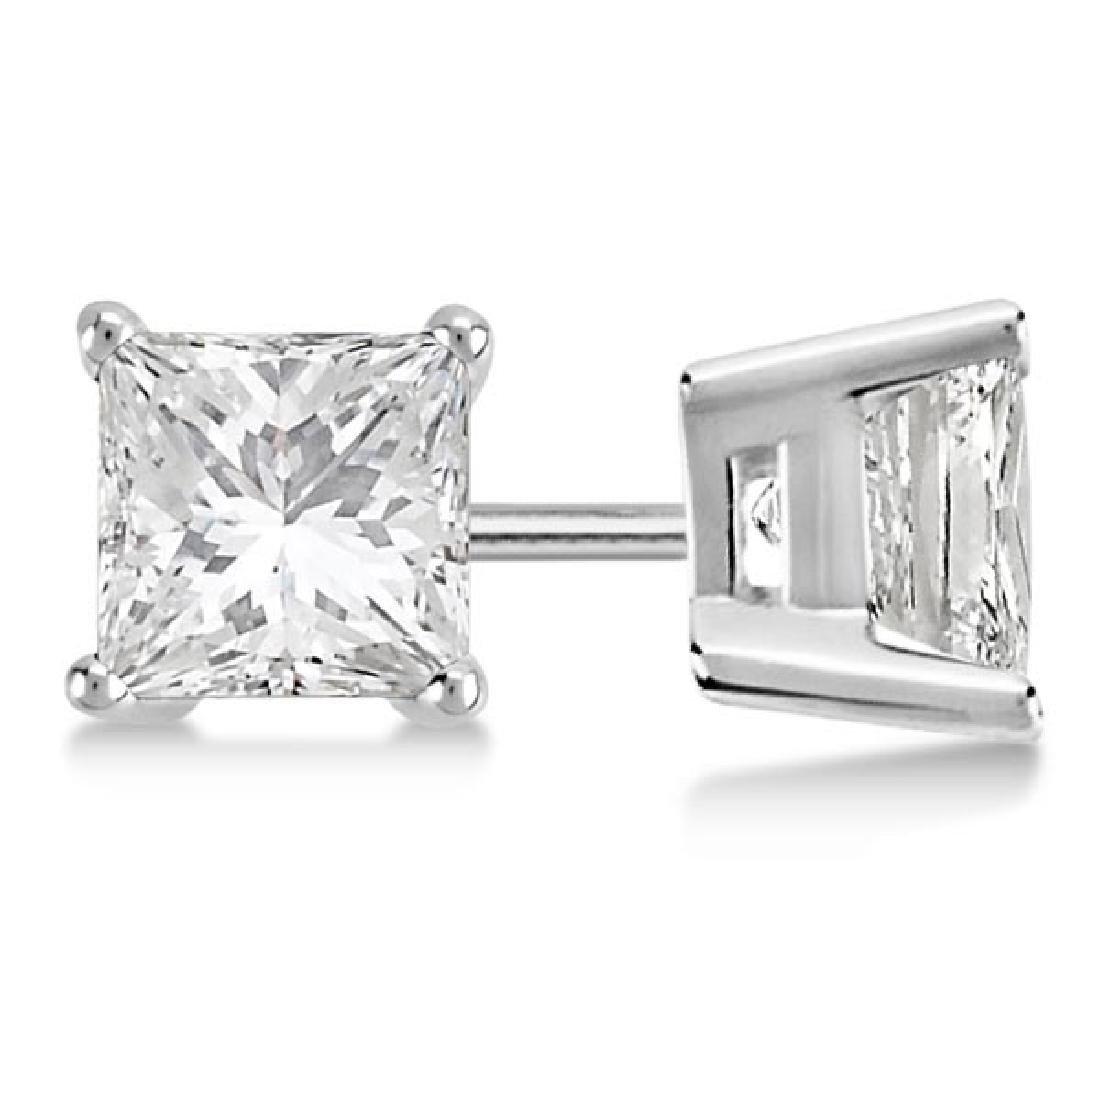 Certified 0.7 CTW Princess Diamond Stud Earrings E/SI2